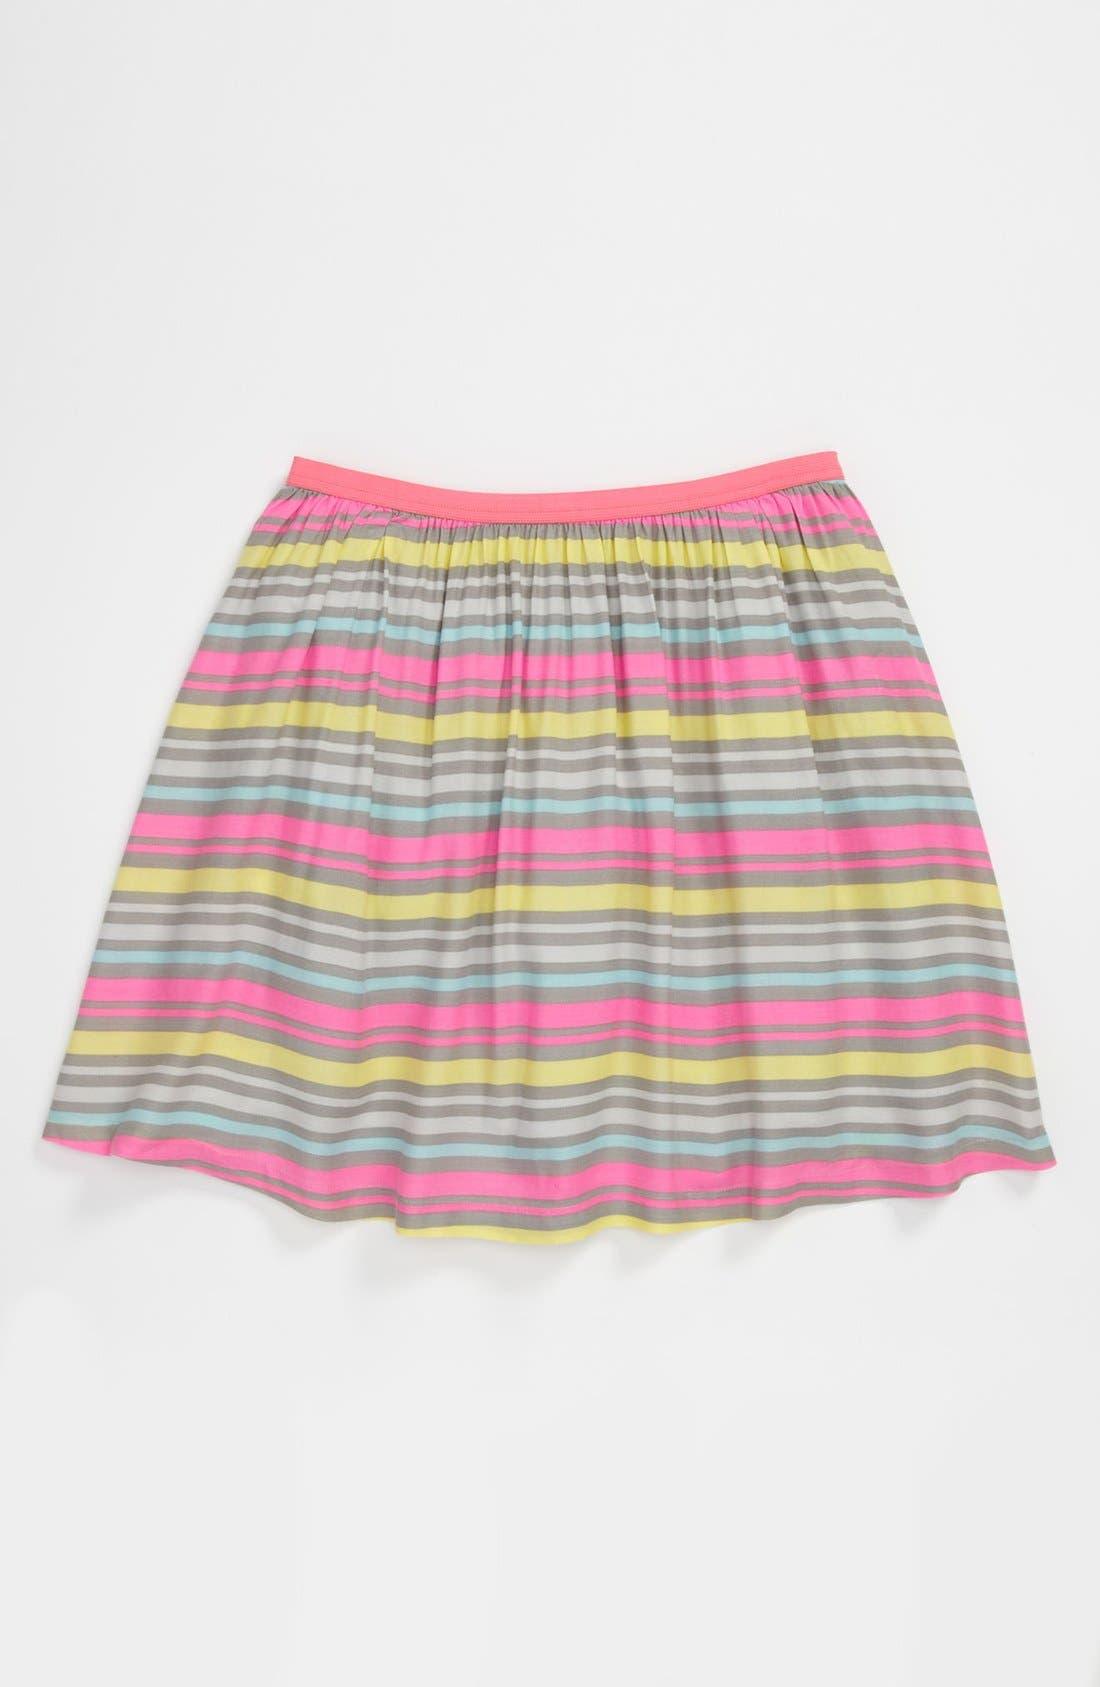 Alternate Image 1 Selected - Ruby & Bloom 'Sasha' Skirt (Big Girls)